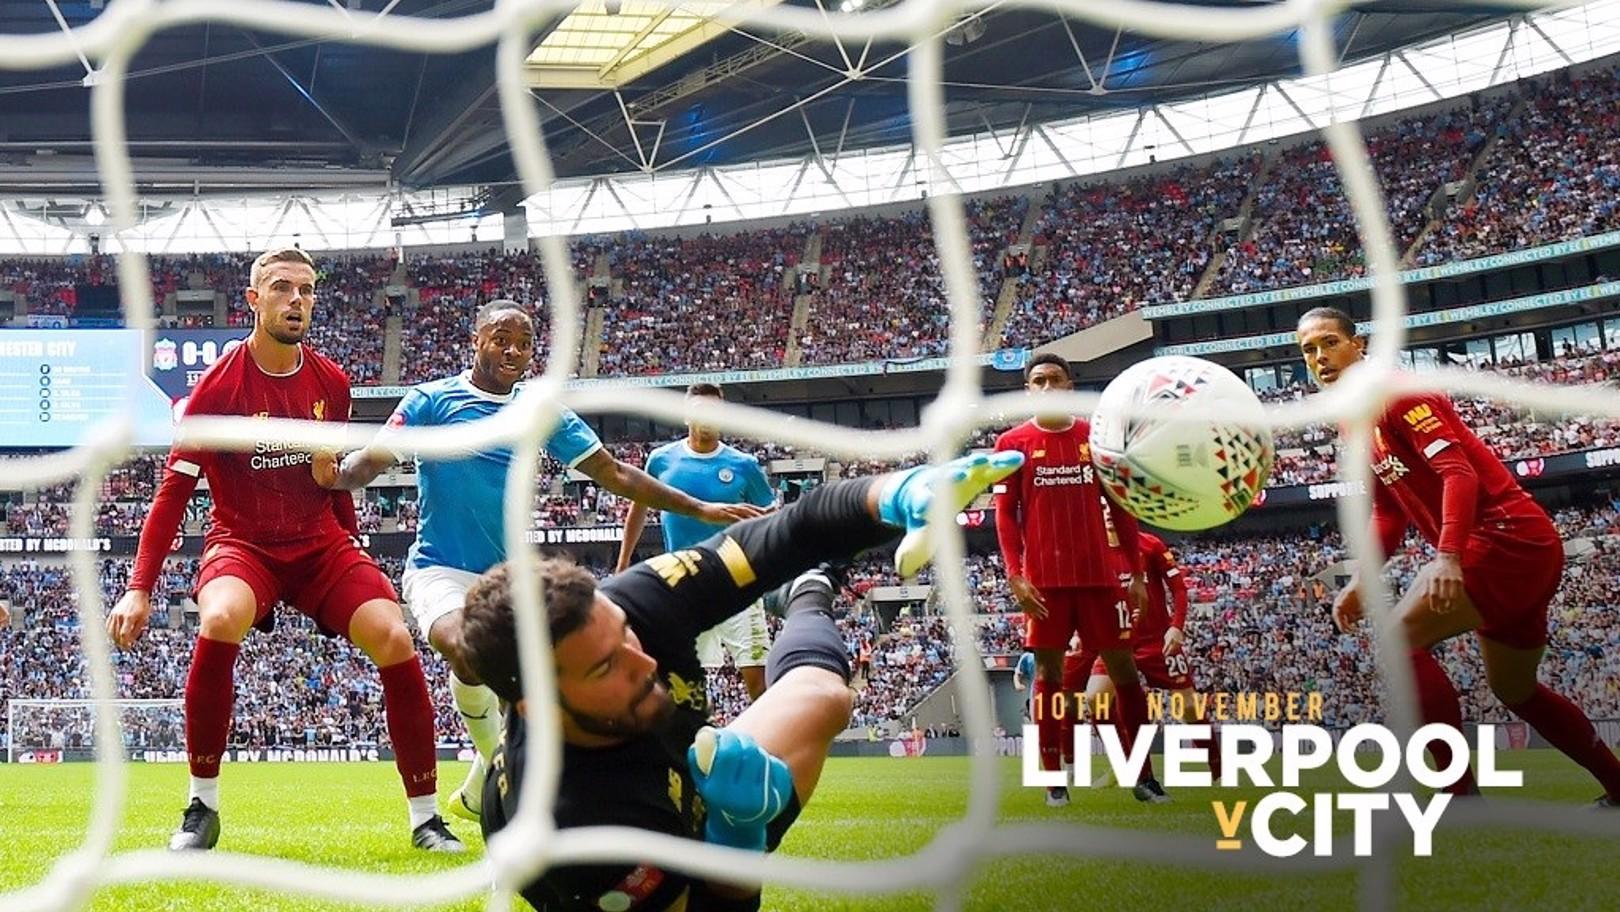 Sur quelles chaînes regarder Liverpool vs City ?